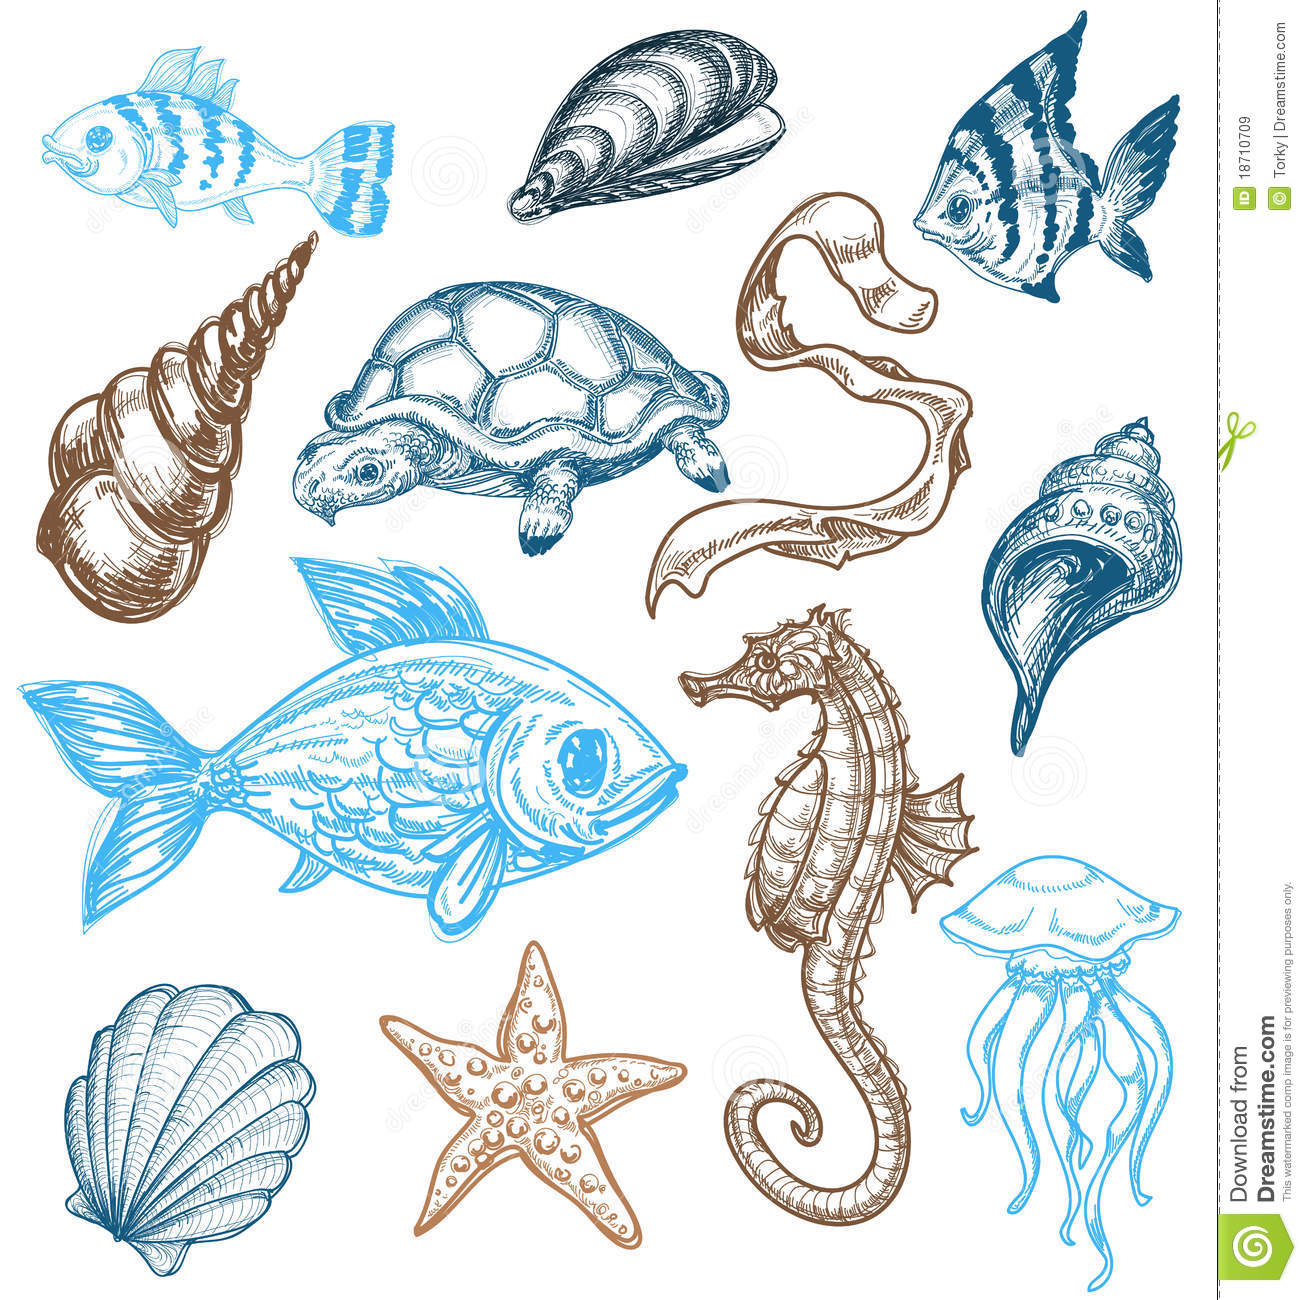 Ocean life clipart - Clipground